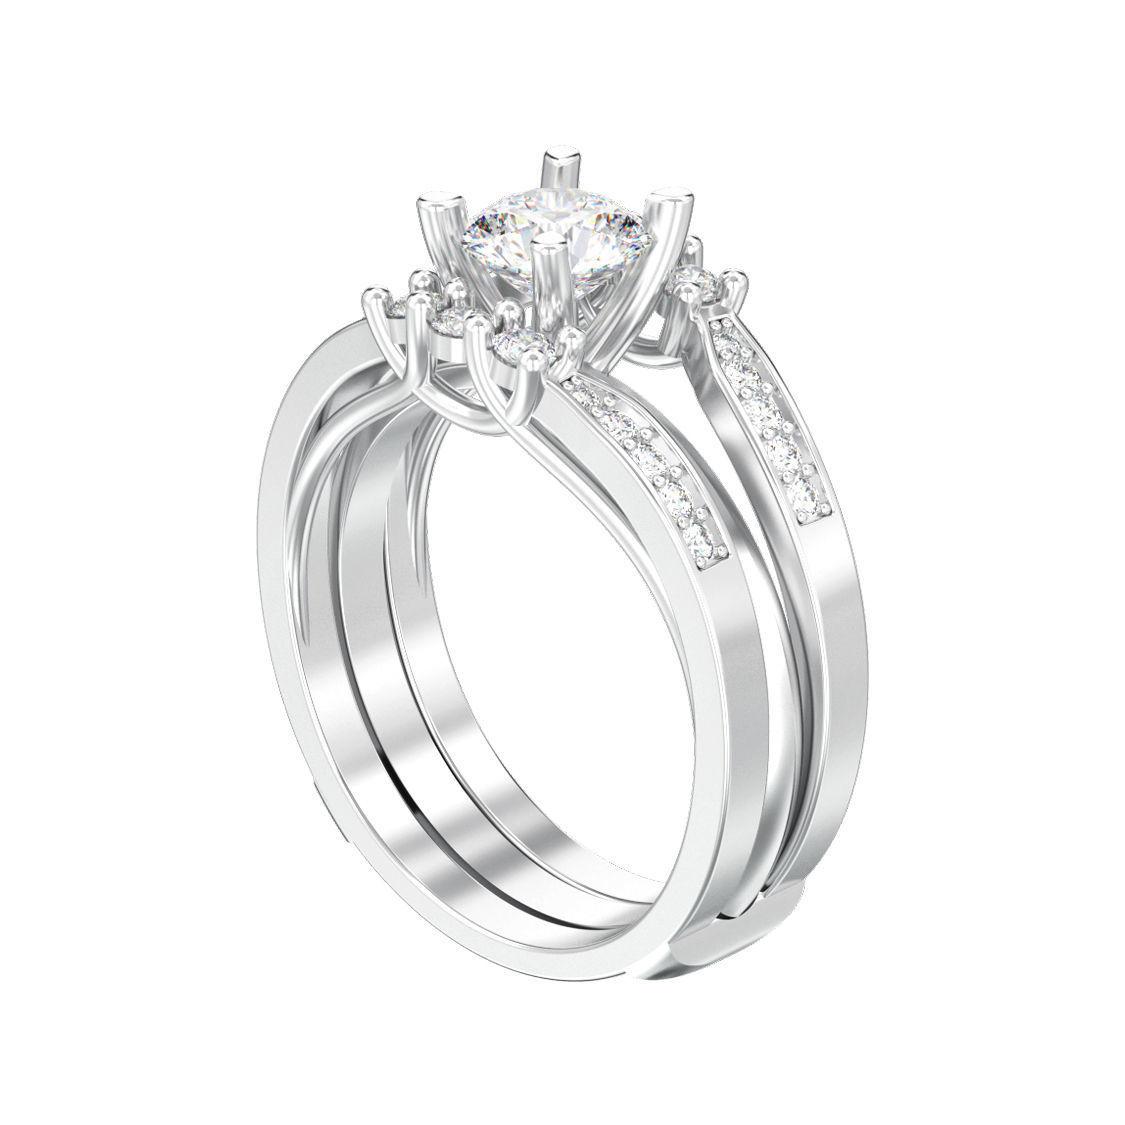 Round split shank engagement diamond ring